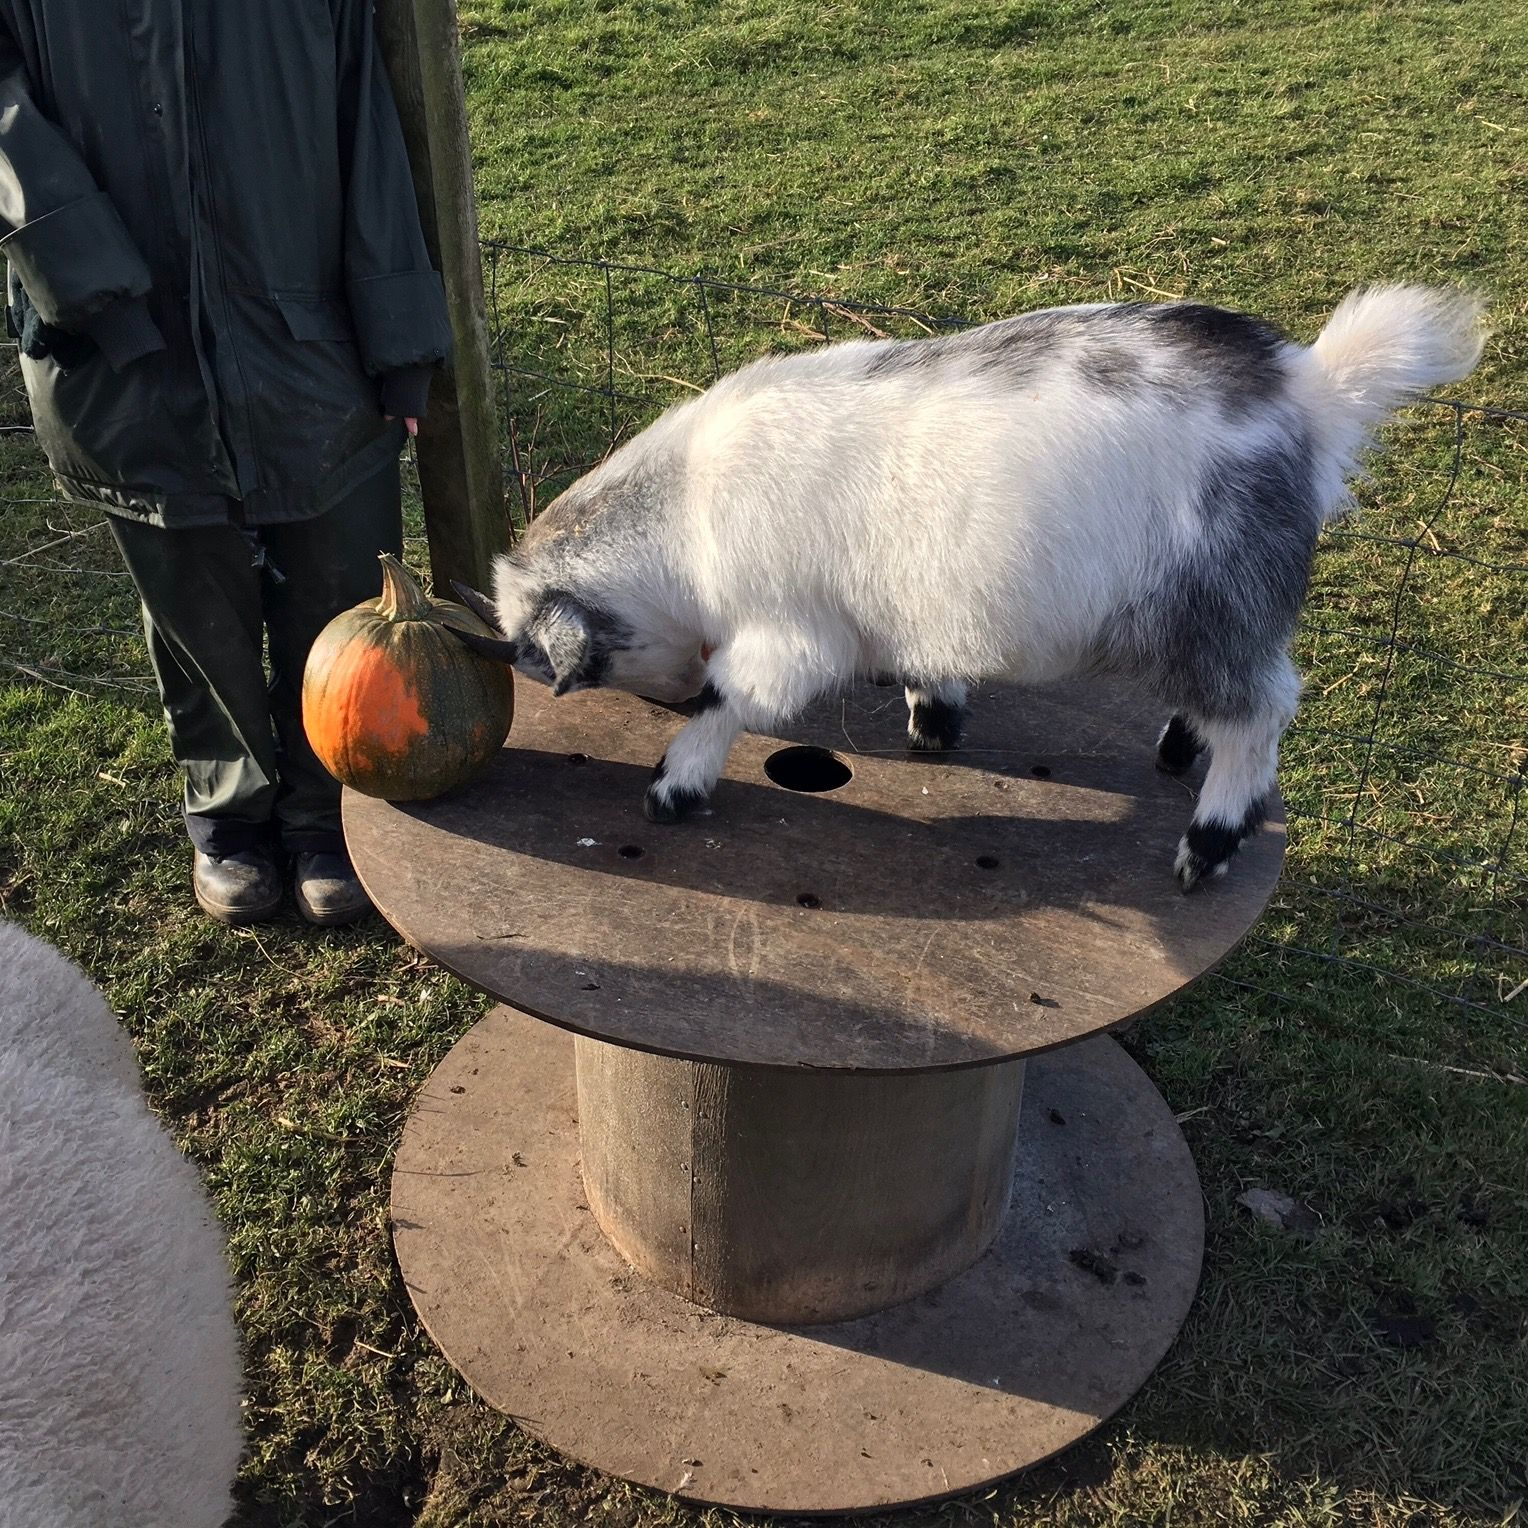 Ty bashing pumpkins! For Halloween, the animals had fun